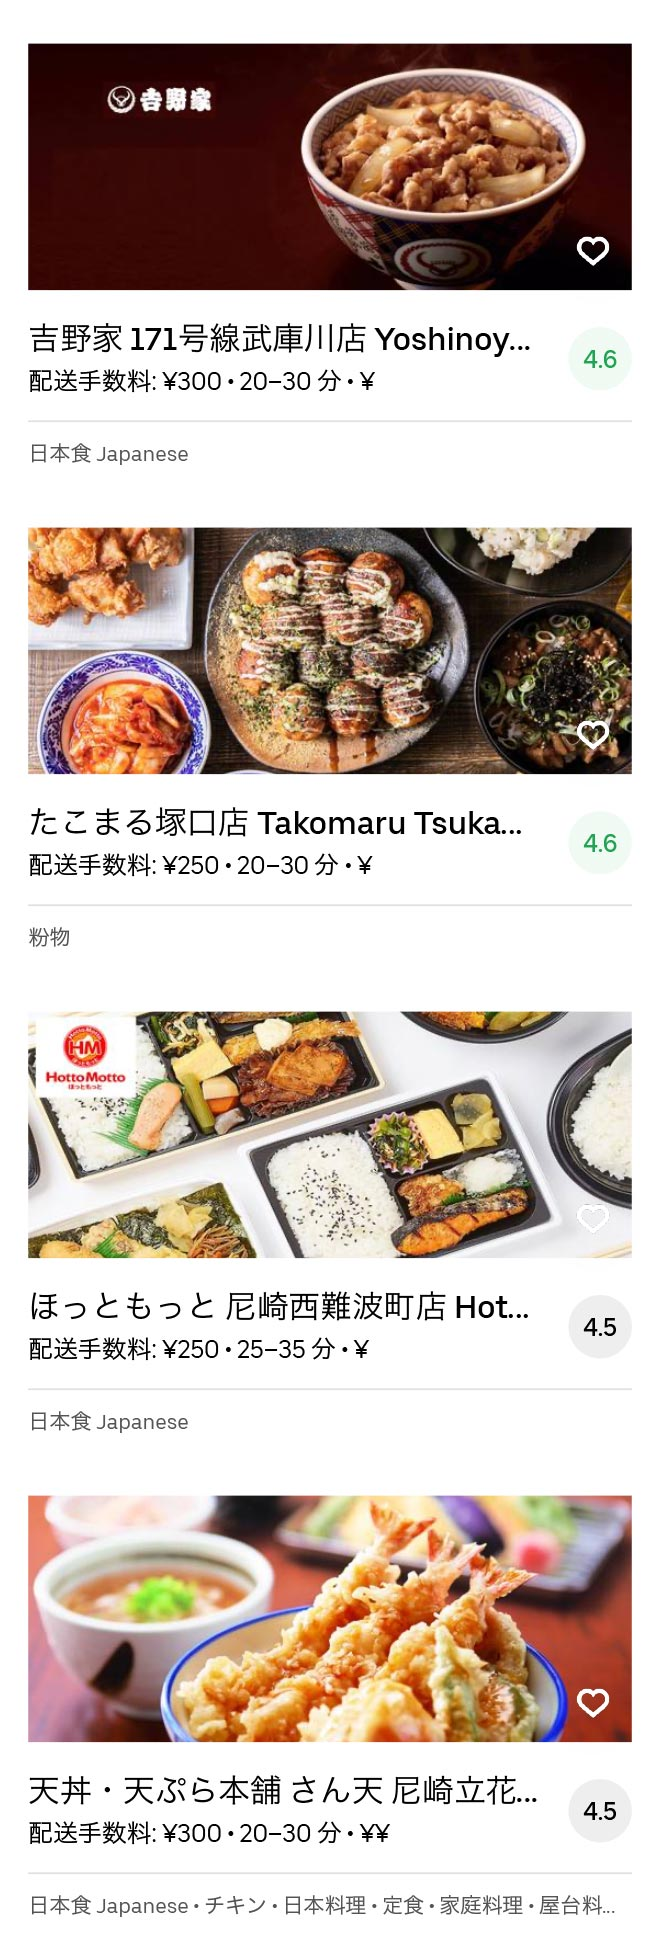 Amagasaki mukonosou menu 2005 06